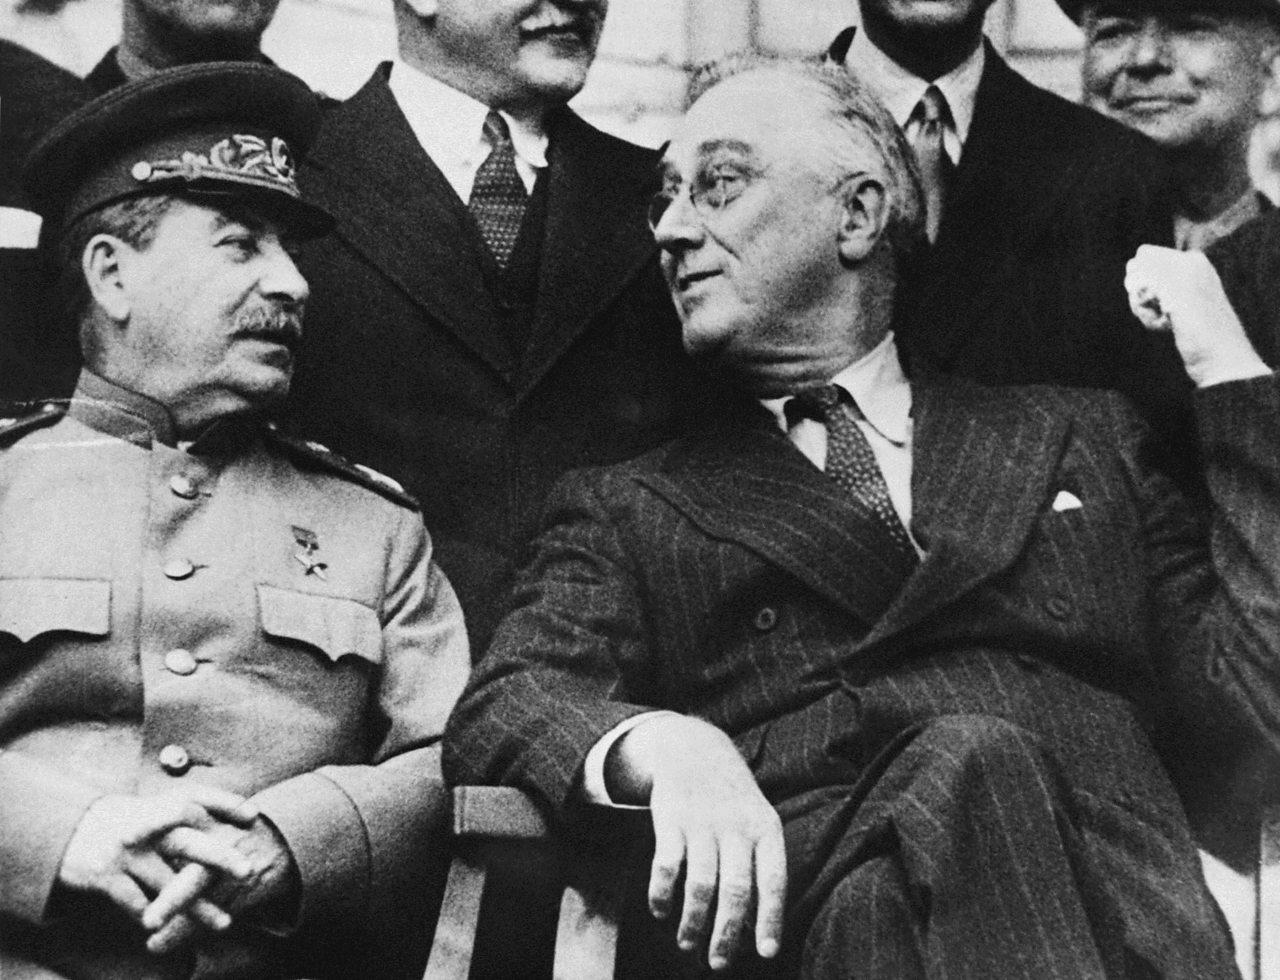 Soviet leader Joseph Stalin and American President Franklin D Roosevelt in 1943.